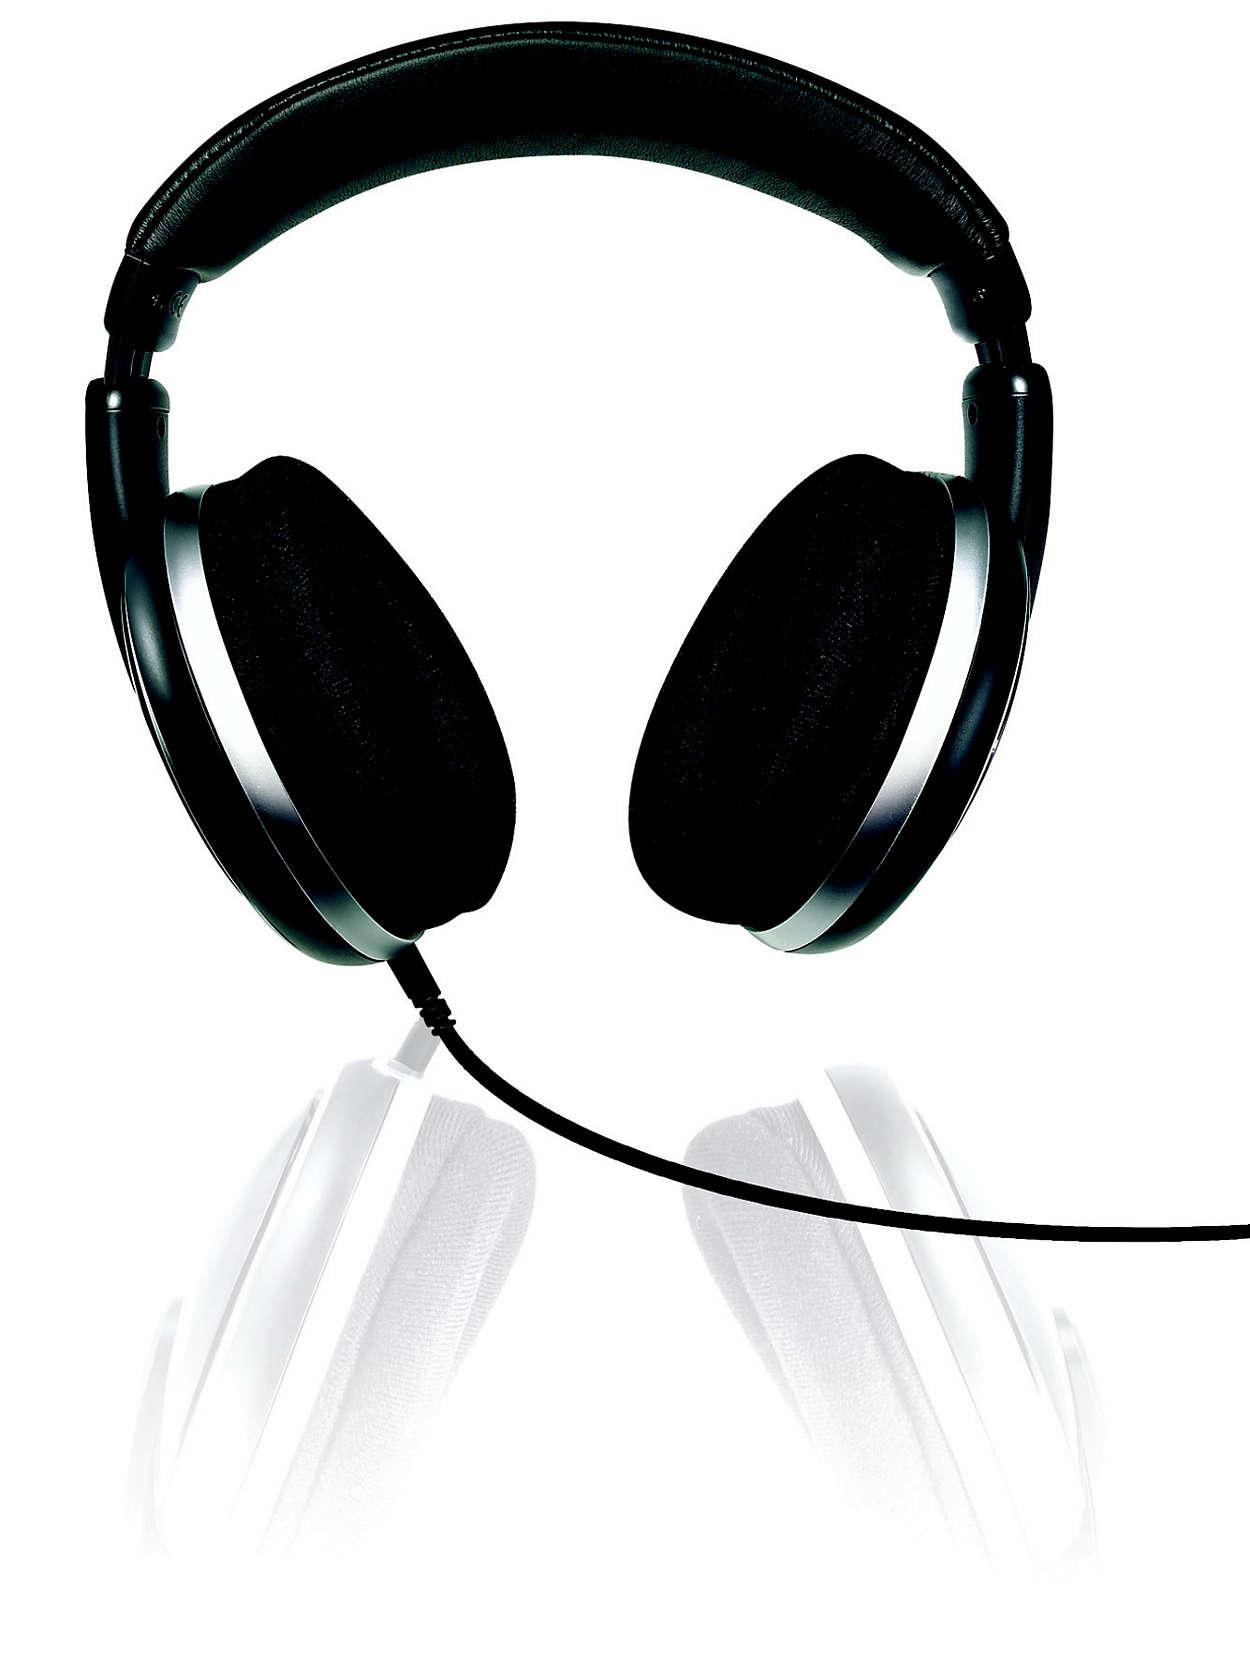 Dynamic HiFi sound performance